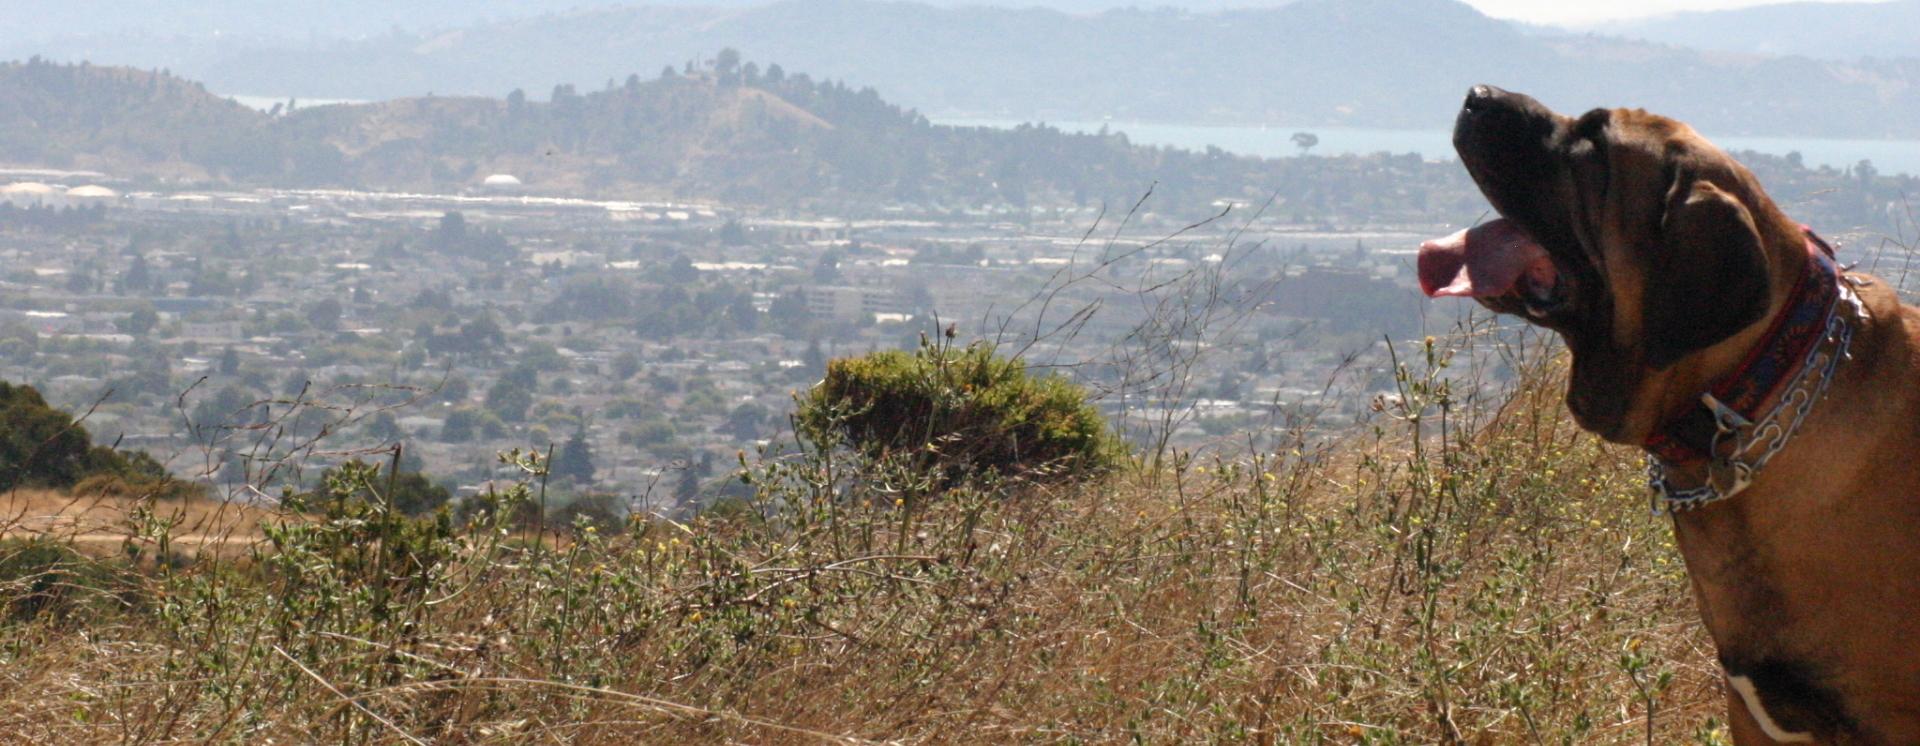 1420725840 rocky on the hills copy